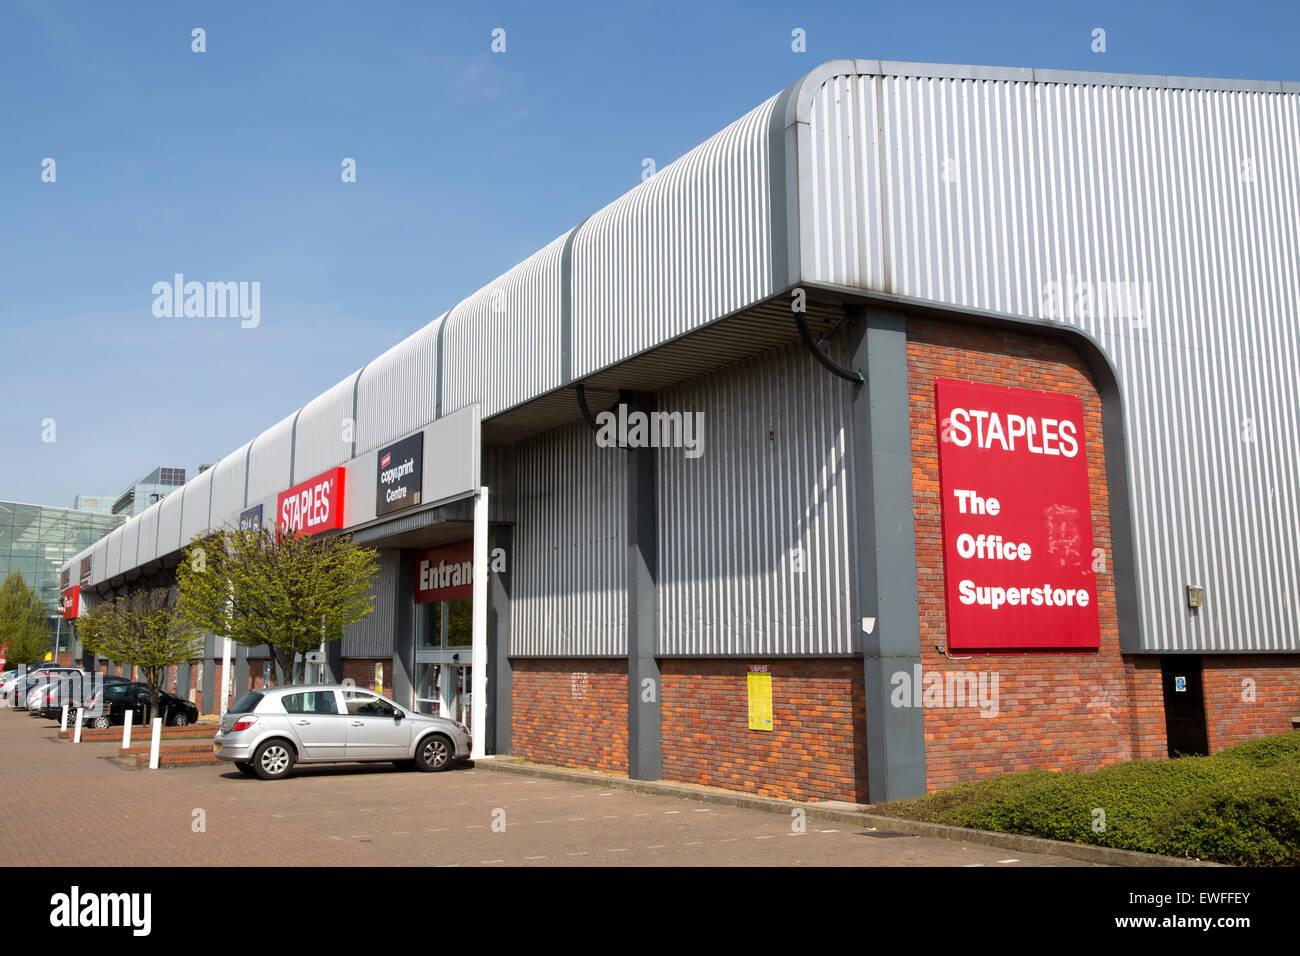 Staples office superstore, Ipswich, Suffolk, England, UK - Stock Image